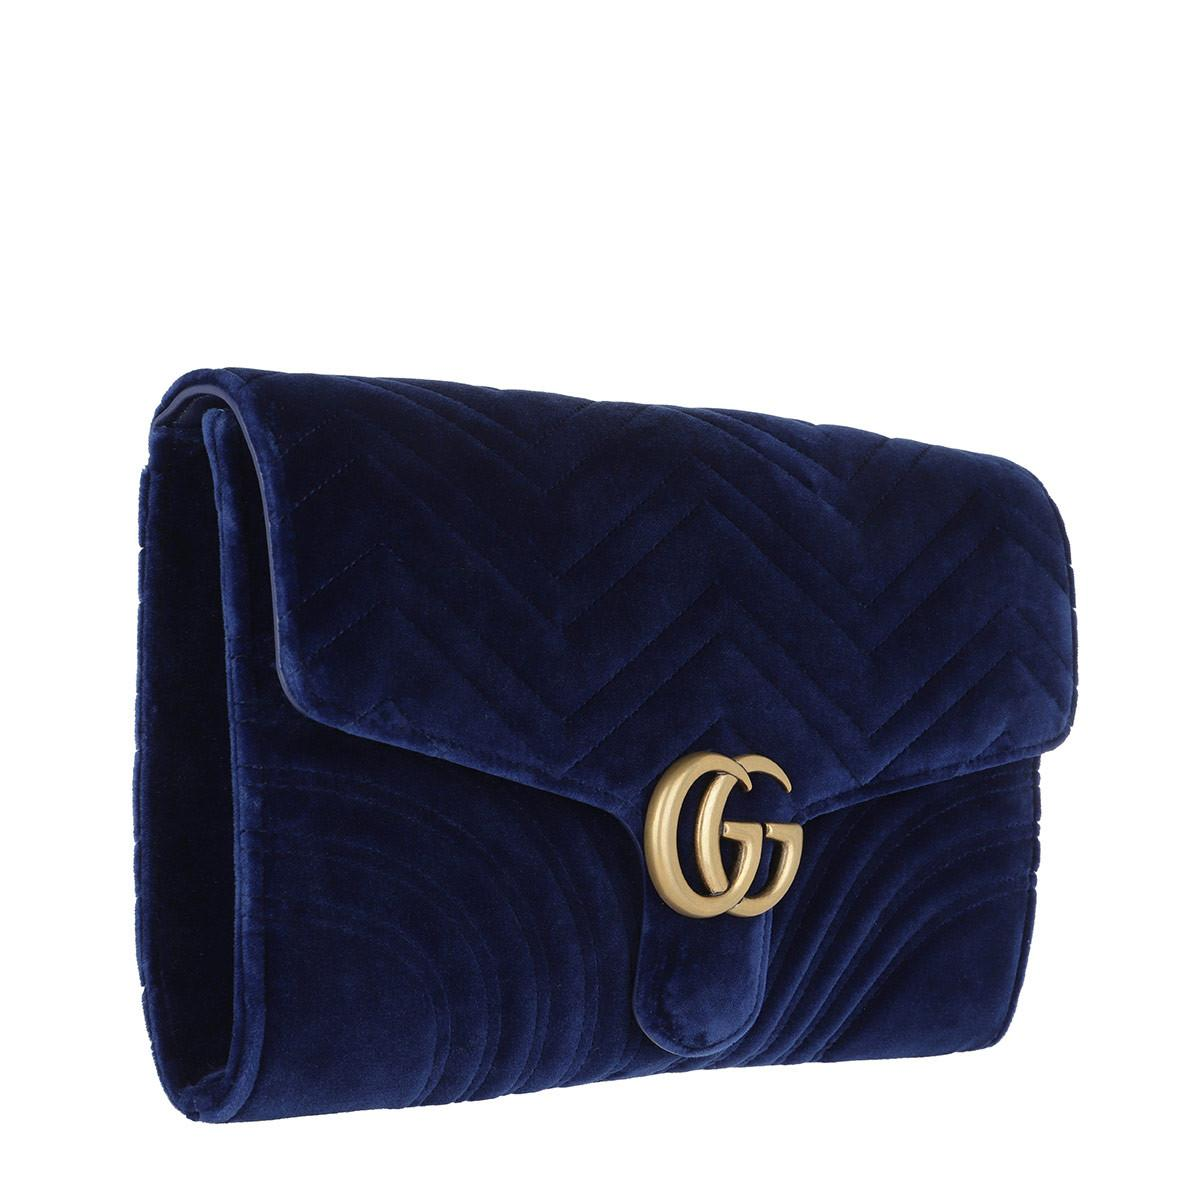 dd000dd1875 Gucci - Blue GG Marmont Velvet Clutch Cobalt - Lyst. View fullscreen